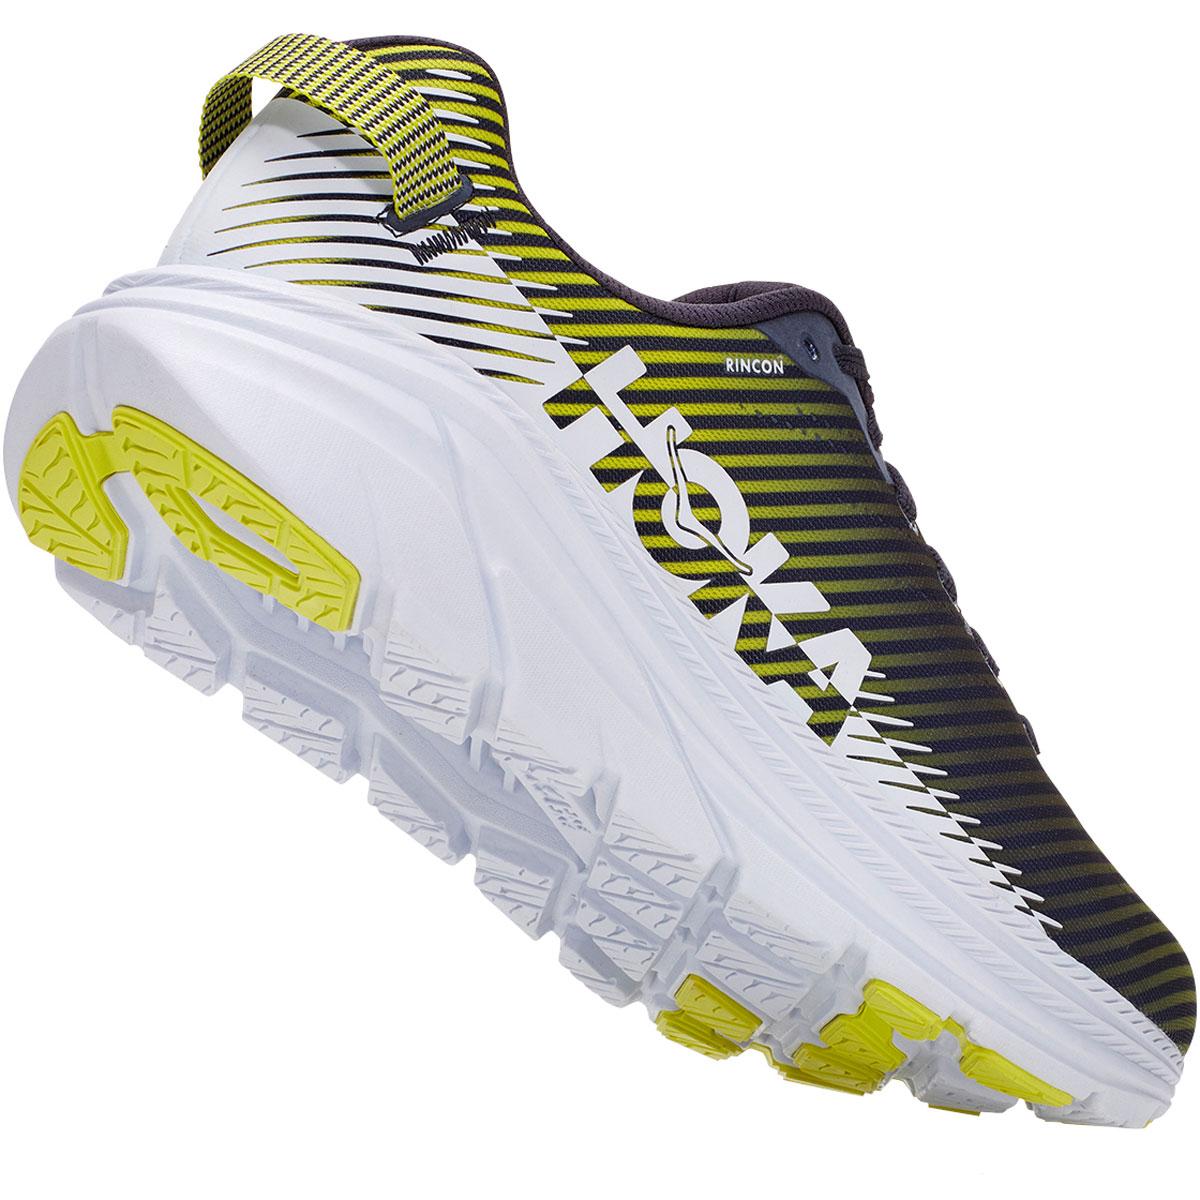 Men's Hoka One One Rincon 2 Running Shoe - Color: Odyssey Grey - Size: 10 - Width: Regular, Odyssey Grey, large, image 5